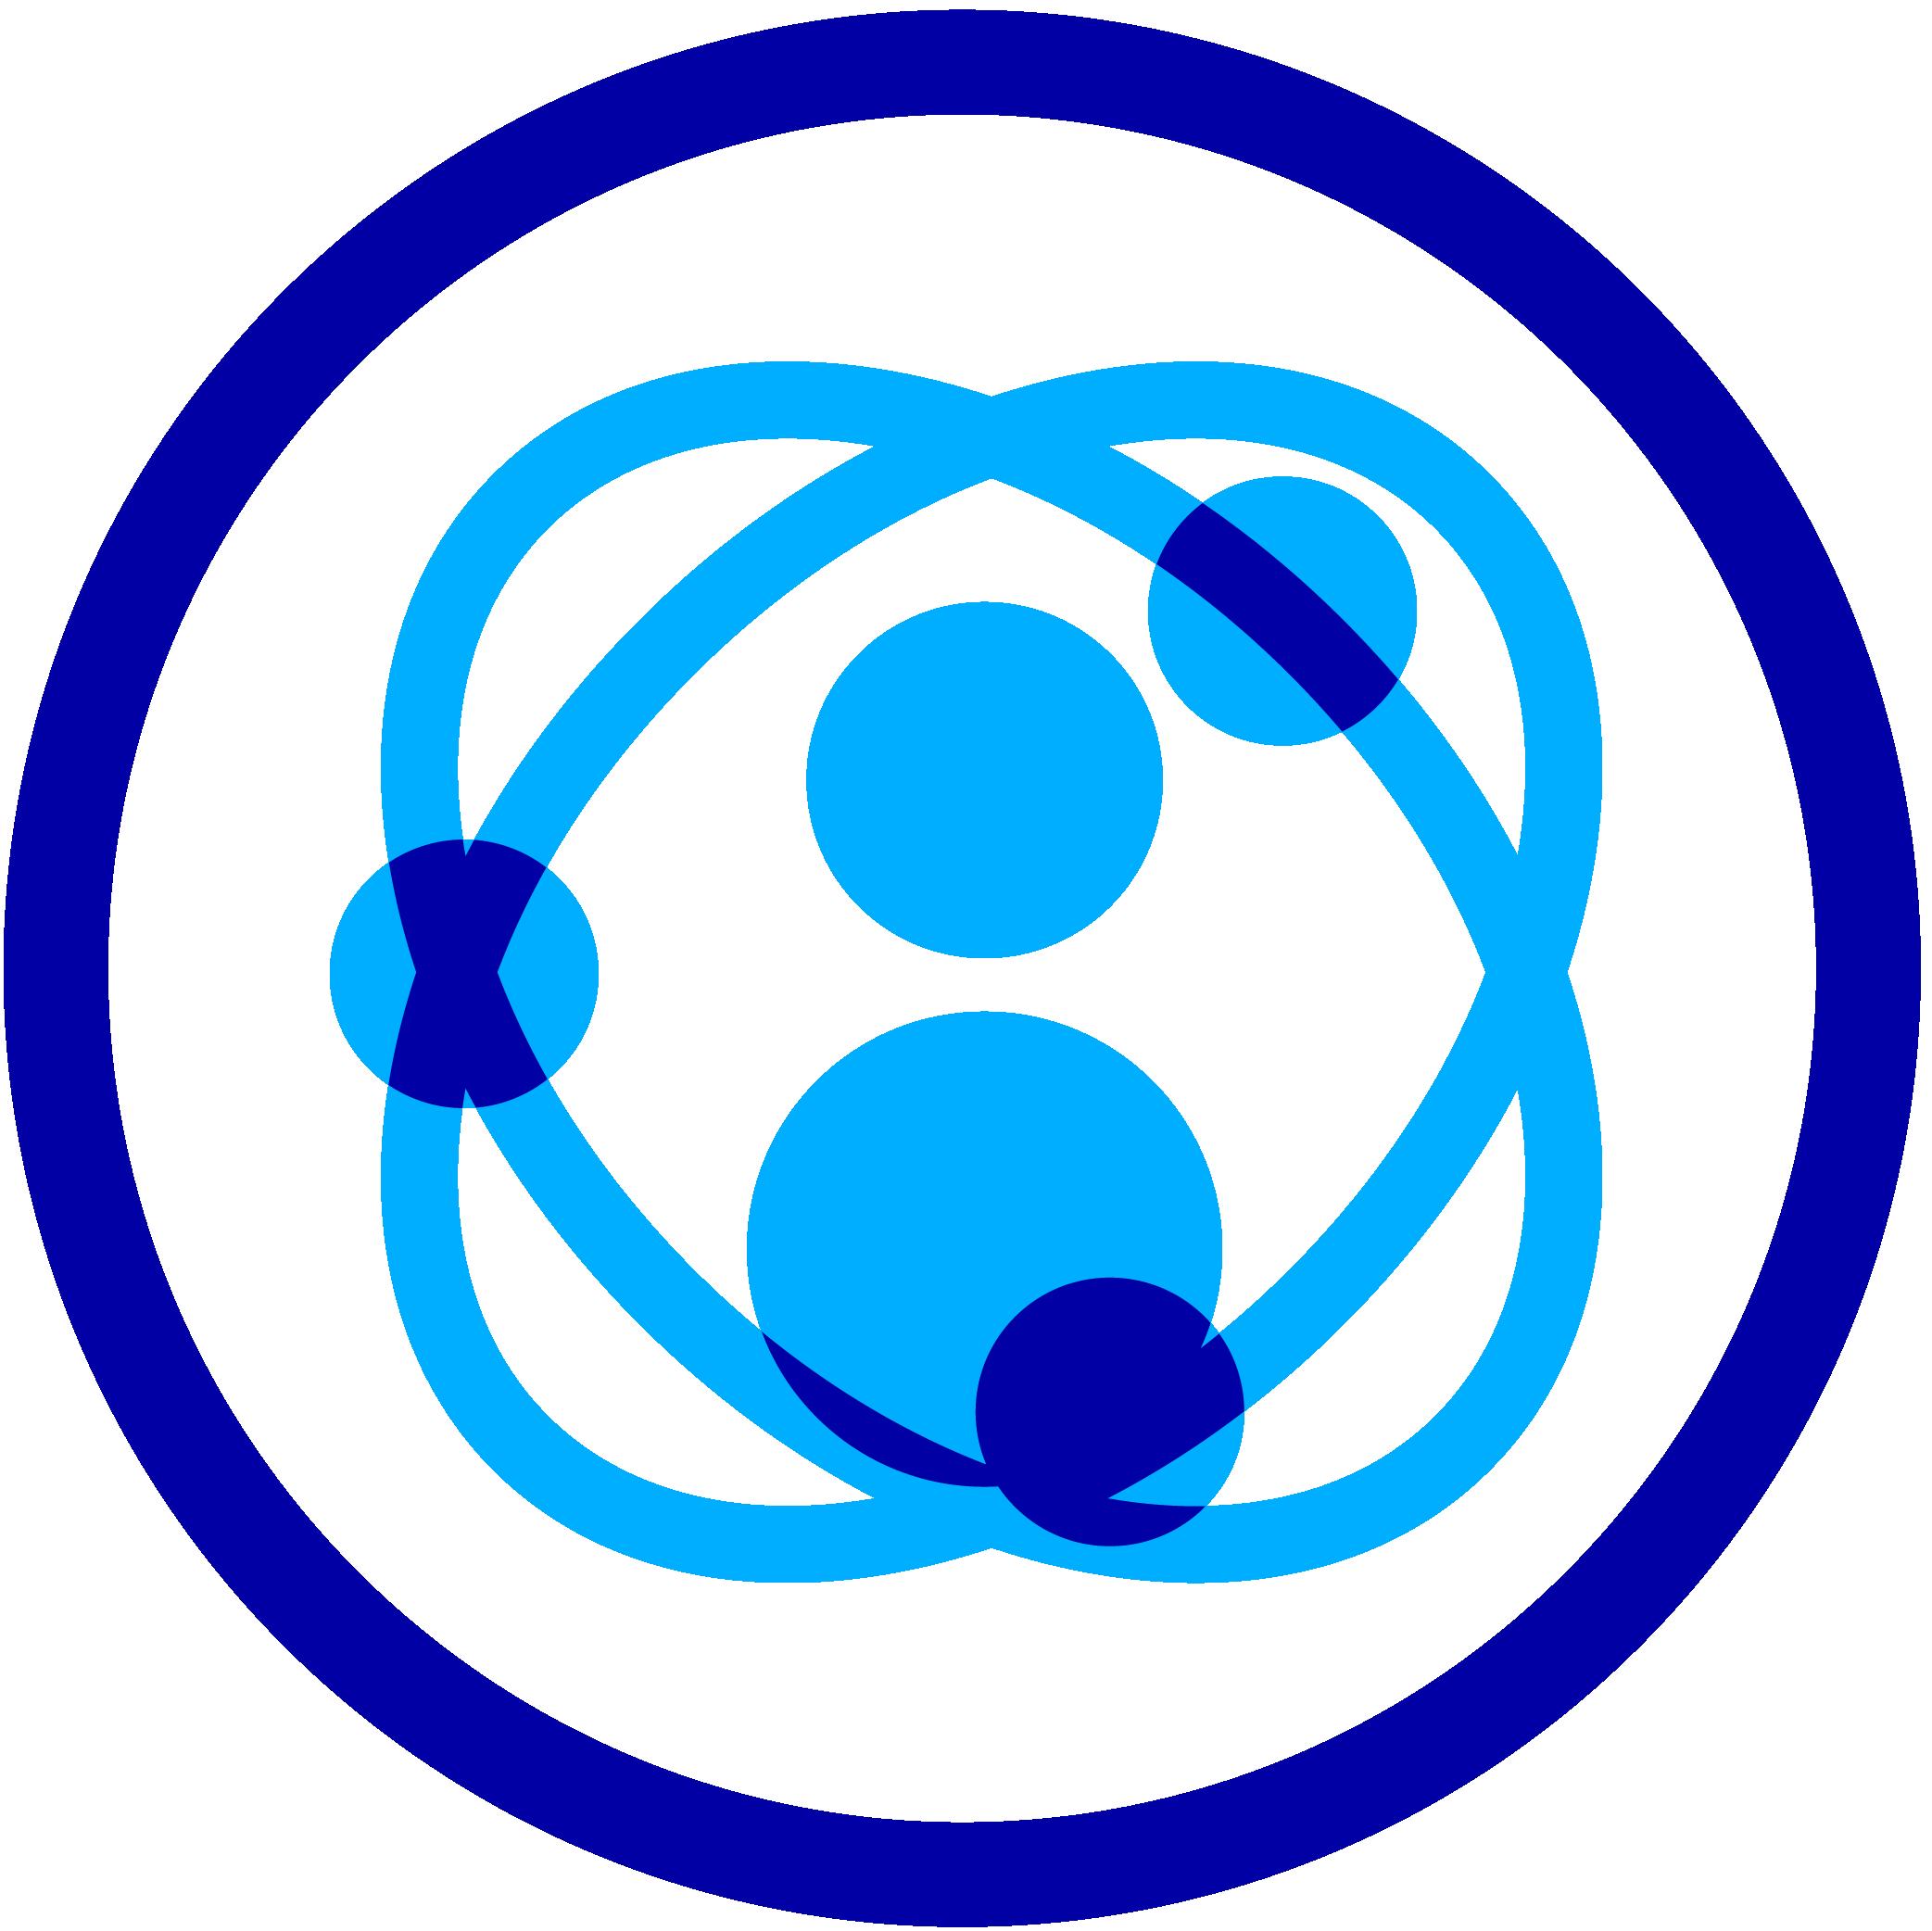 https://co.fi-group.com/wp-content/uploads/sites/14/2021/02/blue-icons-set_1-55.png